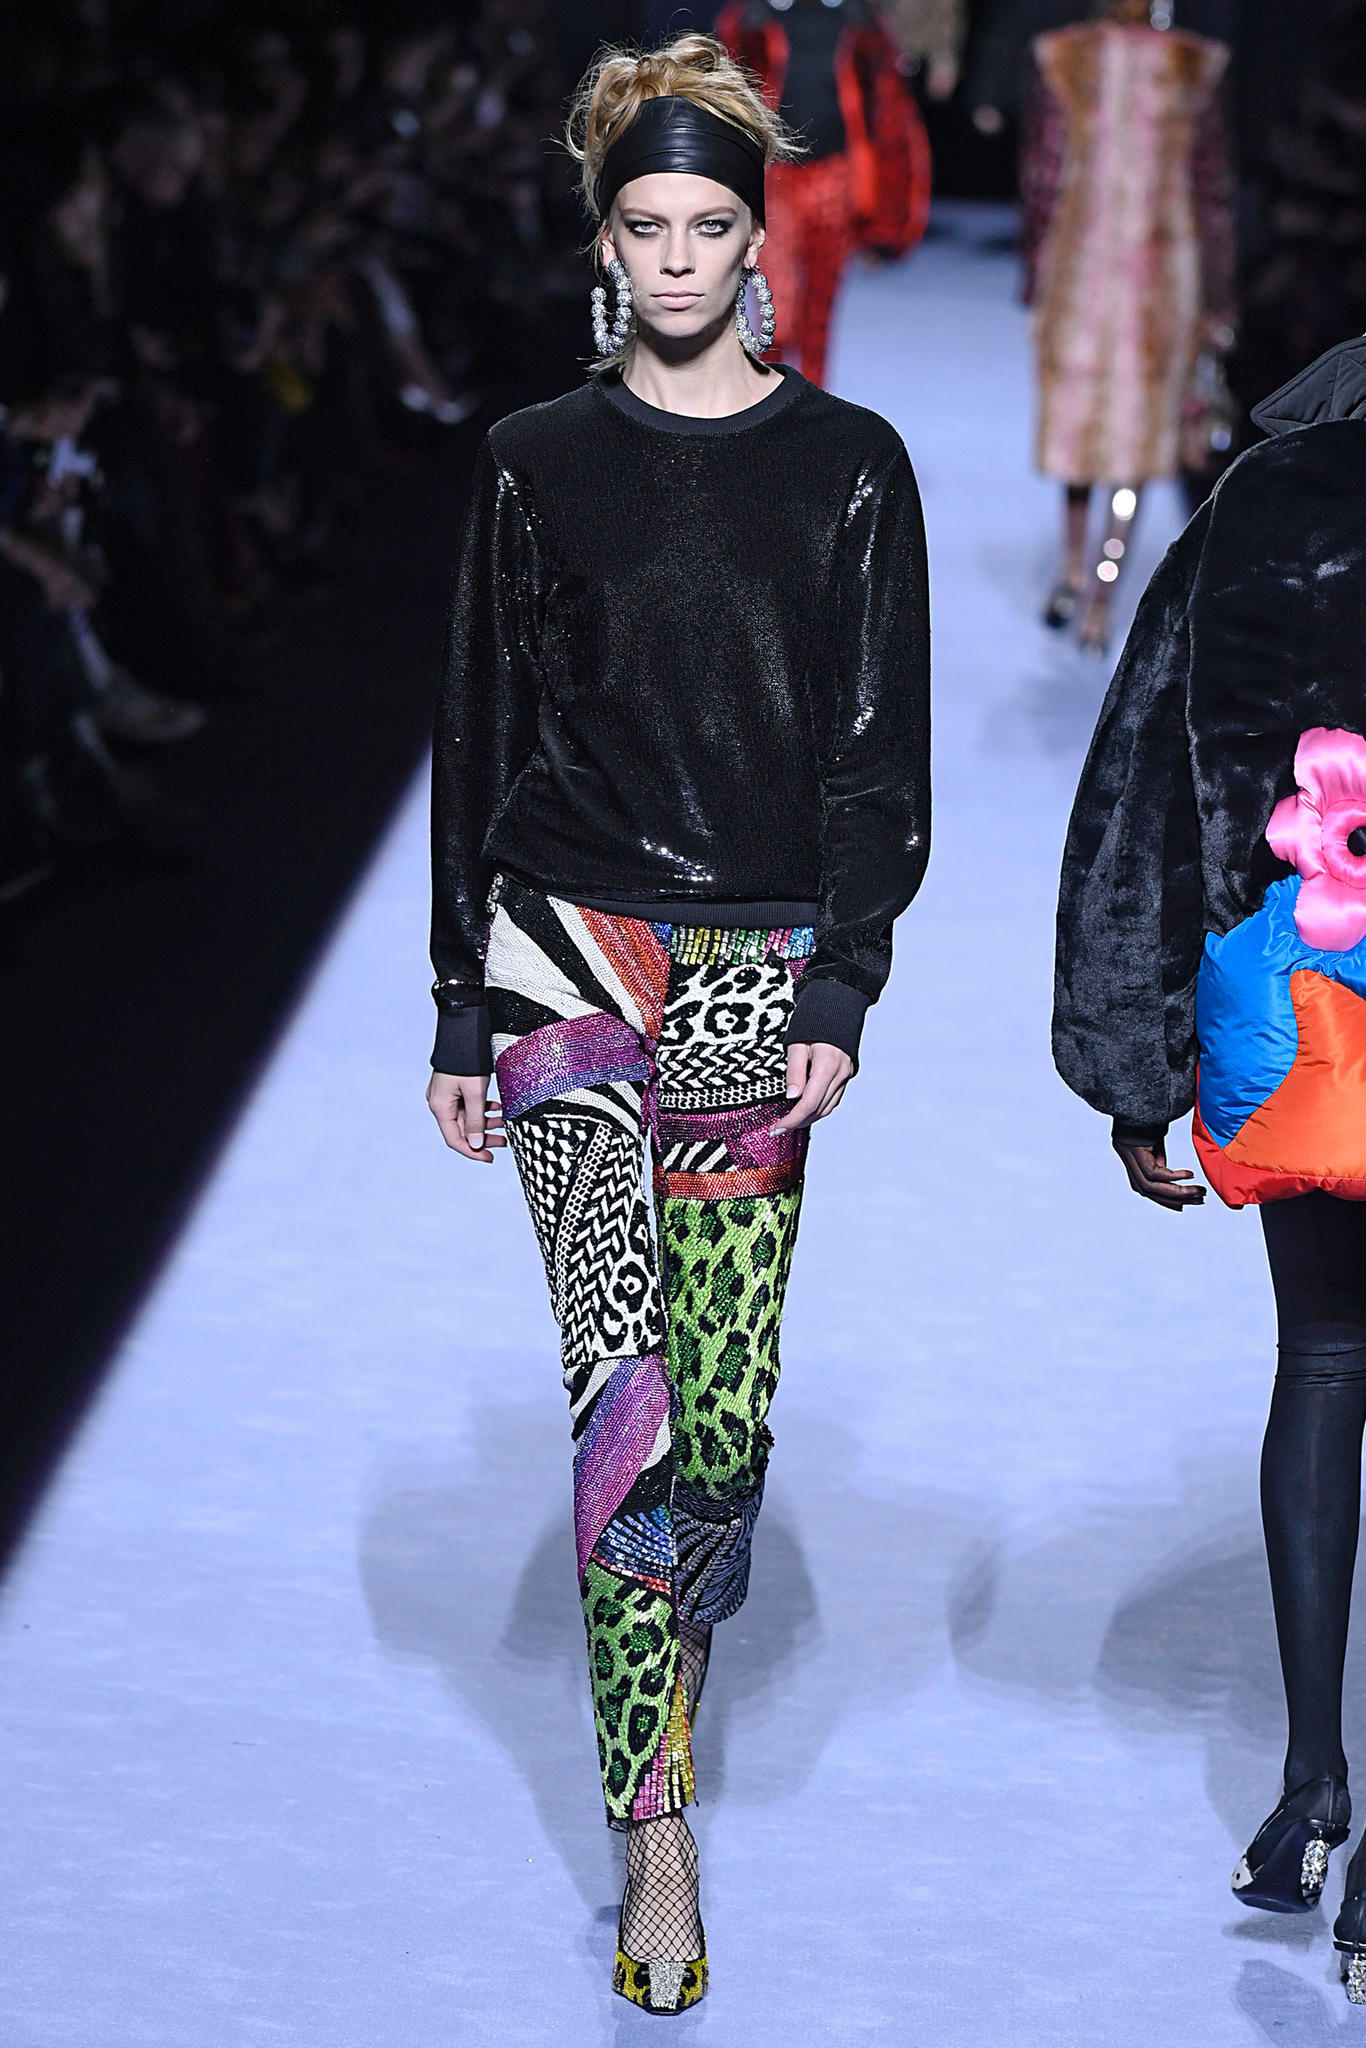 New York Fashion Week: Mix and Match